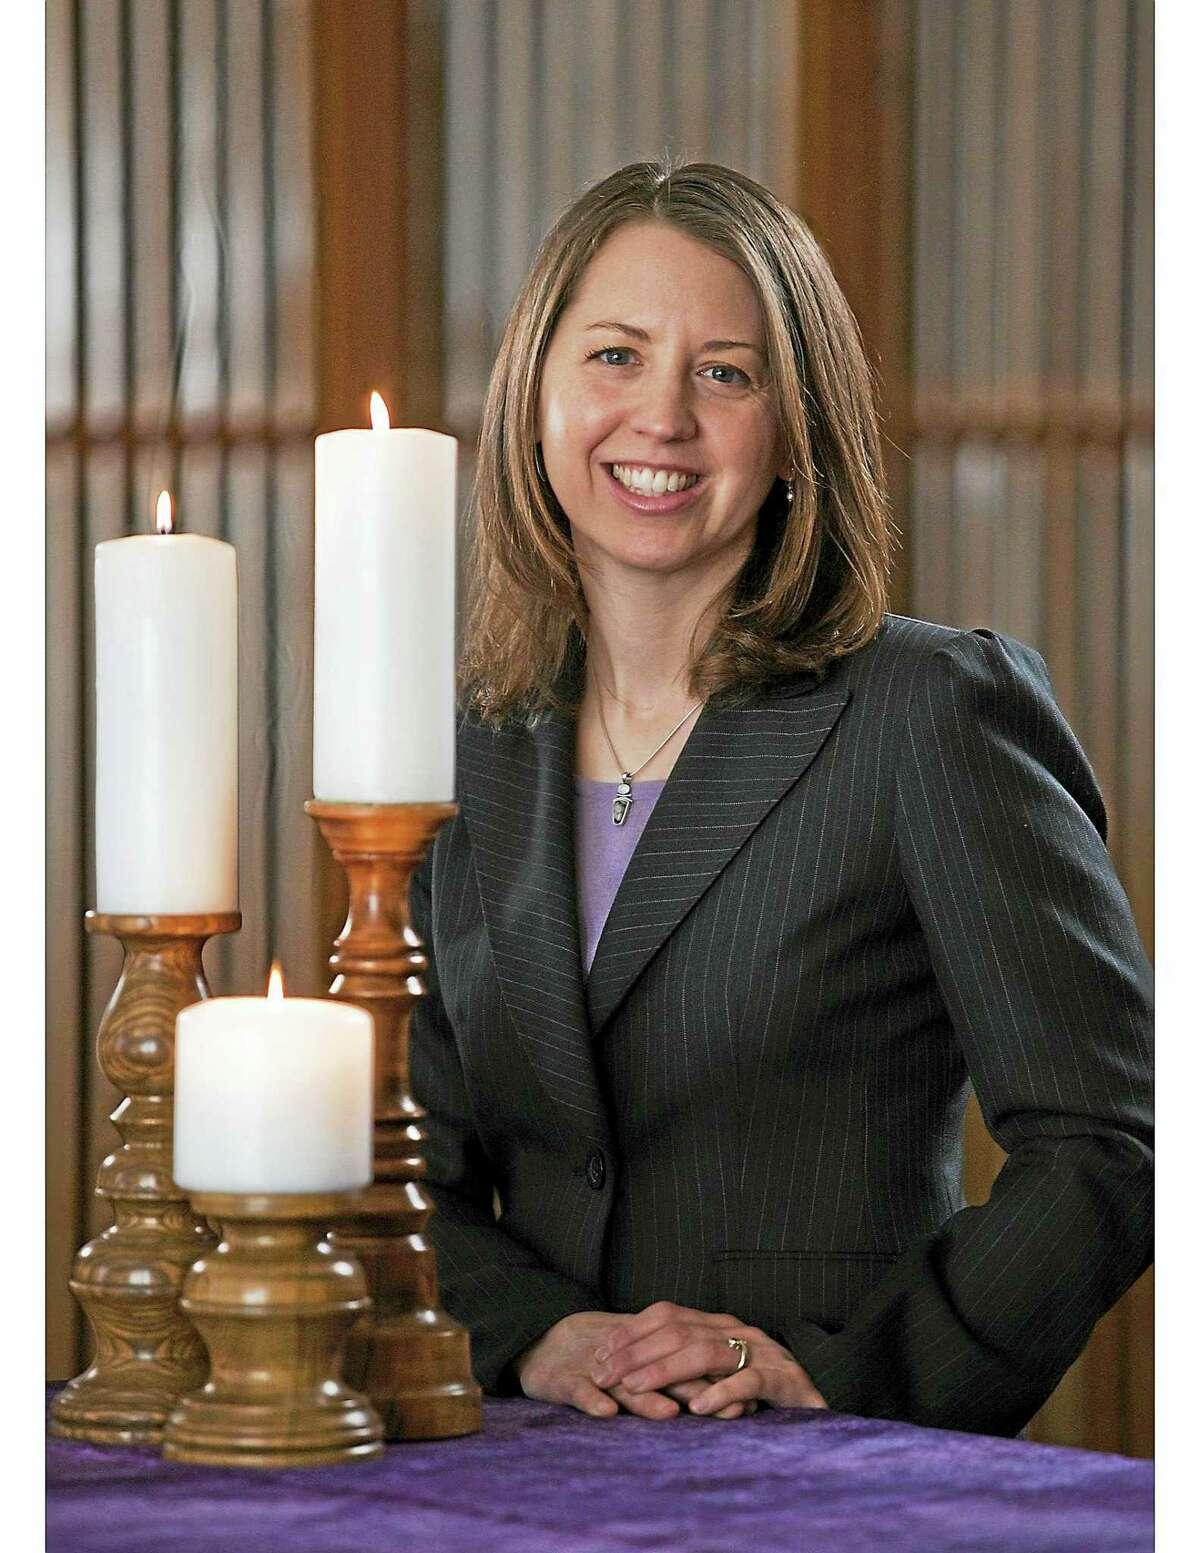 The Rev. Jeanette Cooper Hicks